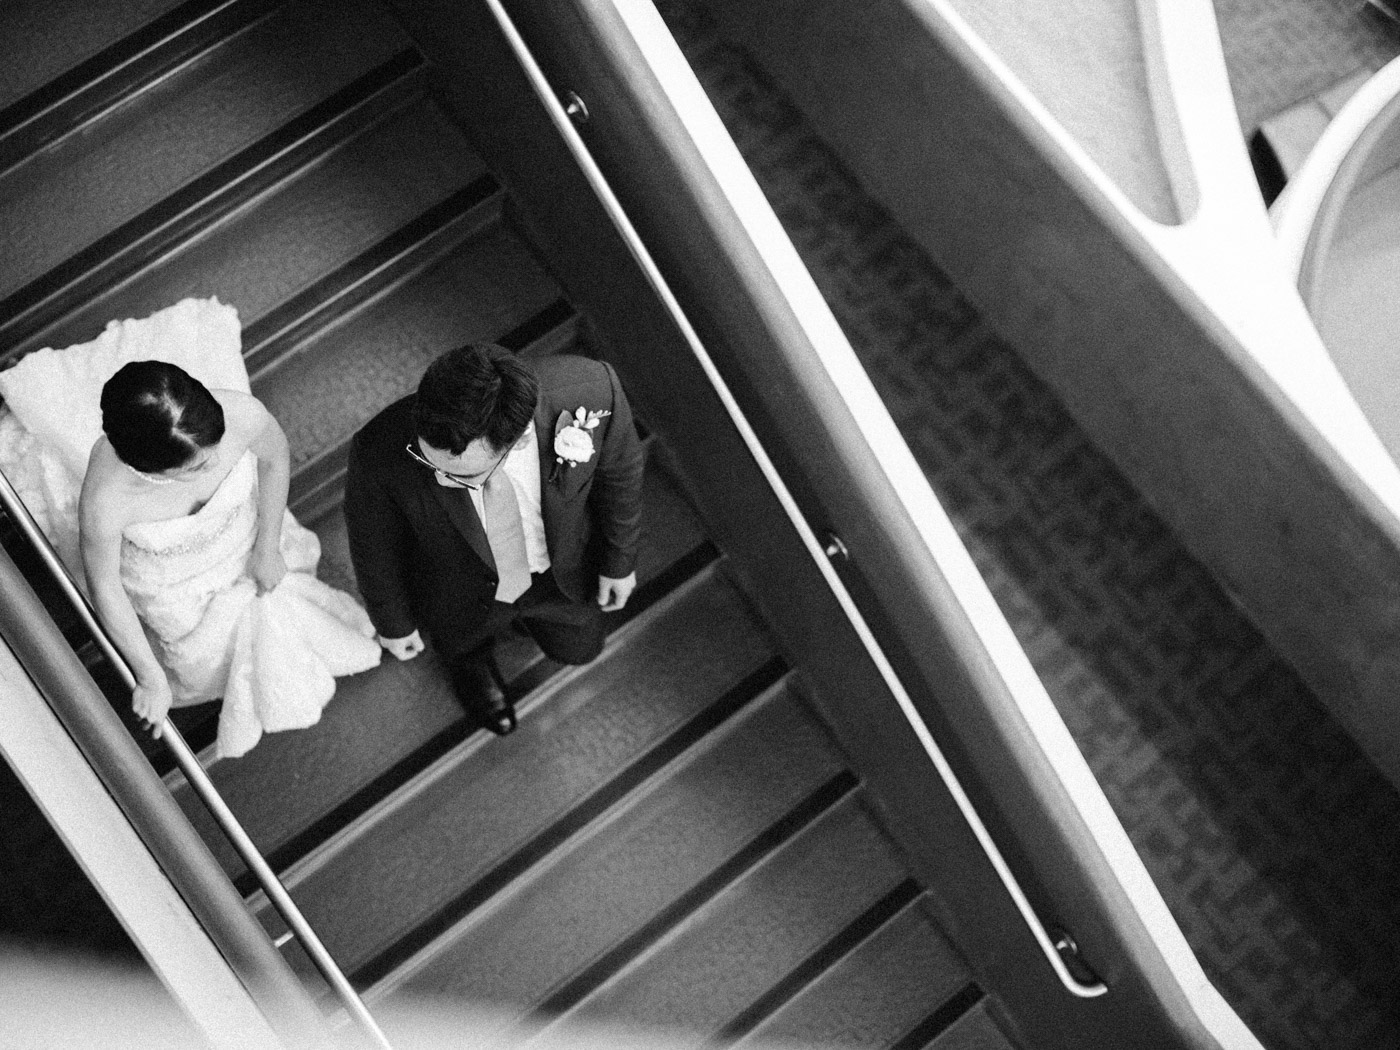 toronto_wedding_photographer_fine_art_documentary_photography-80.jpg